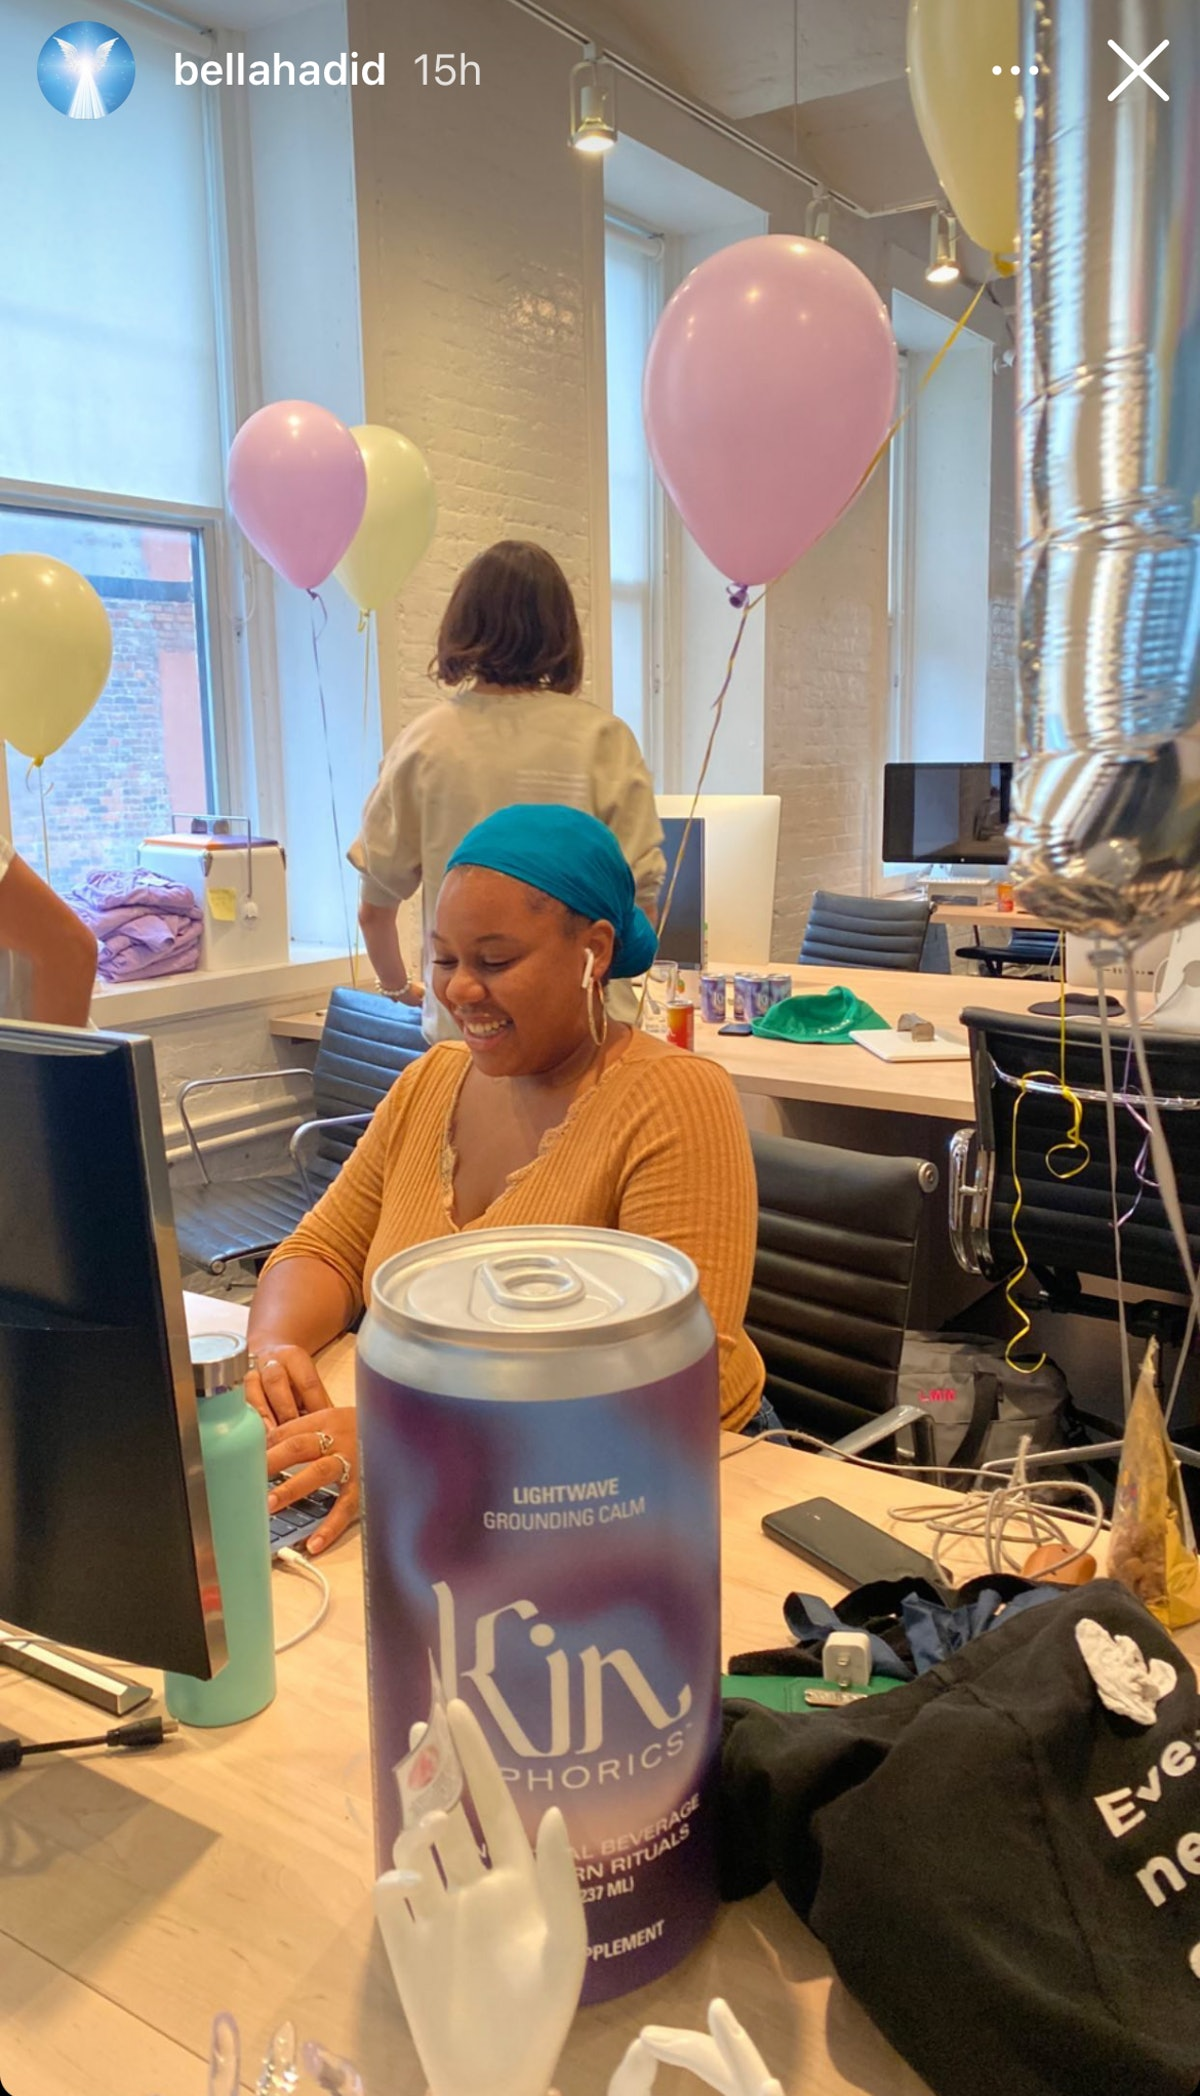 A look at Kin Euphorics headquarters, Bella Hadid's new office